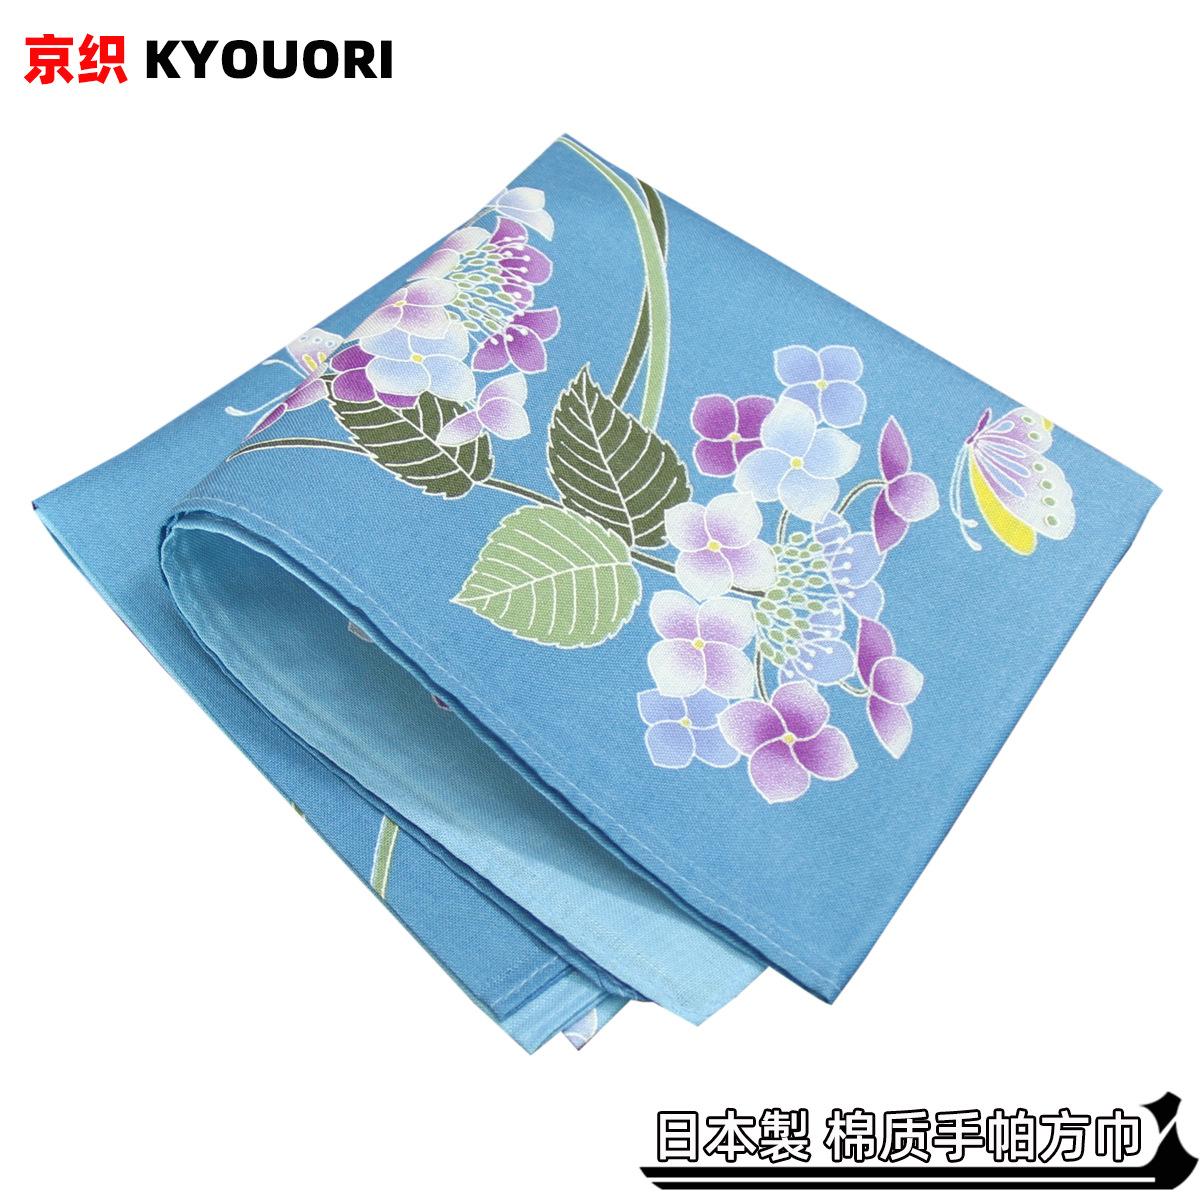 Kyooori large womens cotton handkerchief wind LV Fu square towel printed pattern cartoon handkerchief light and soft 53cm